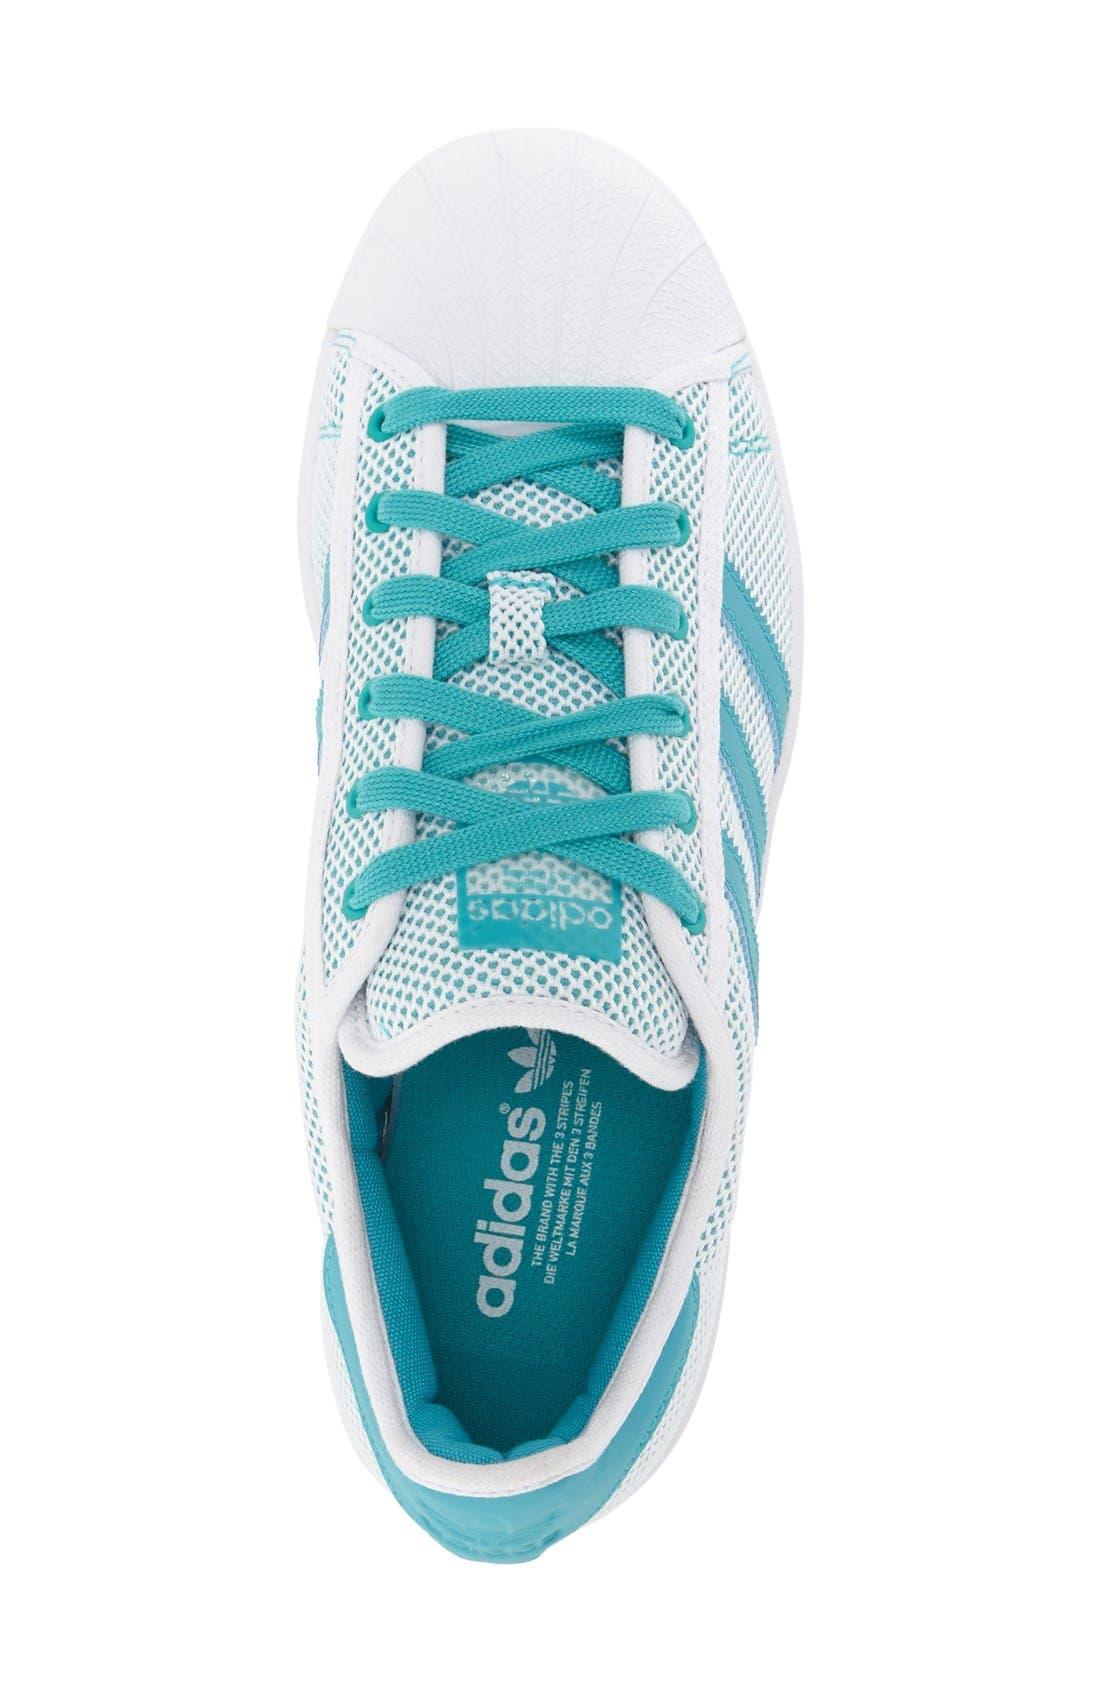 Alternate Image 3  - adidas 'Superstar ADICOLOR' Sneaker (Women)